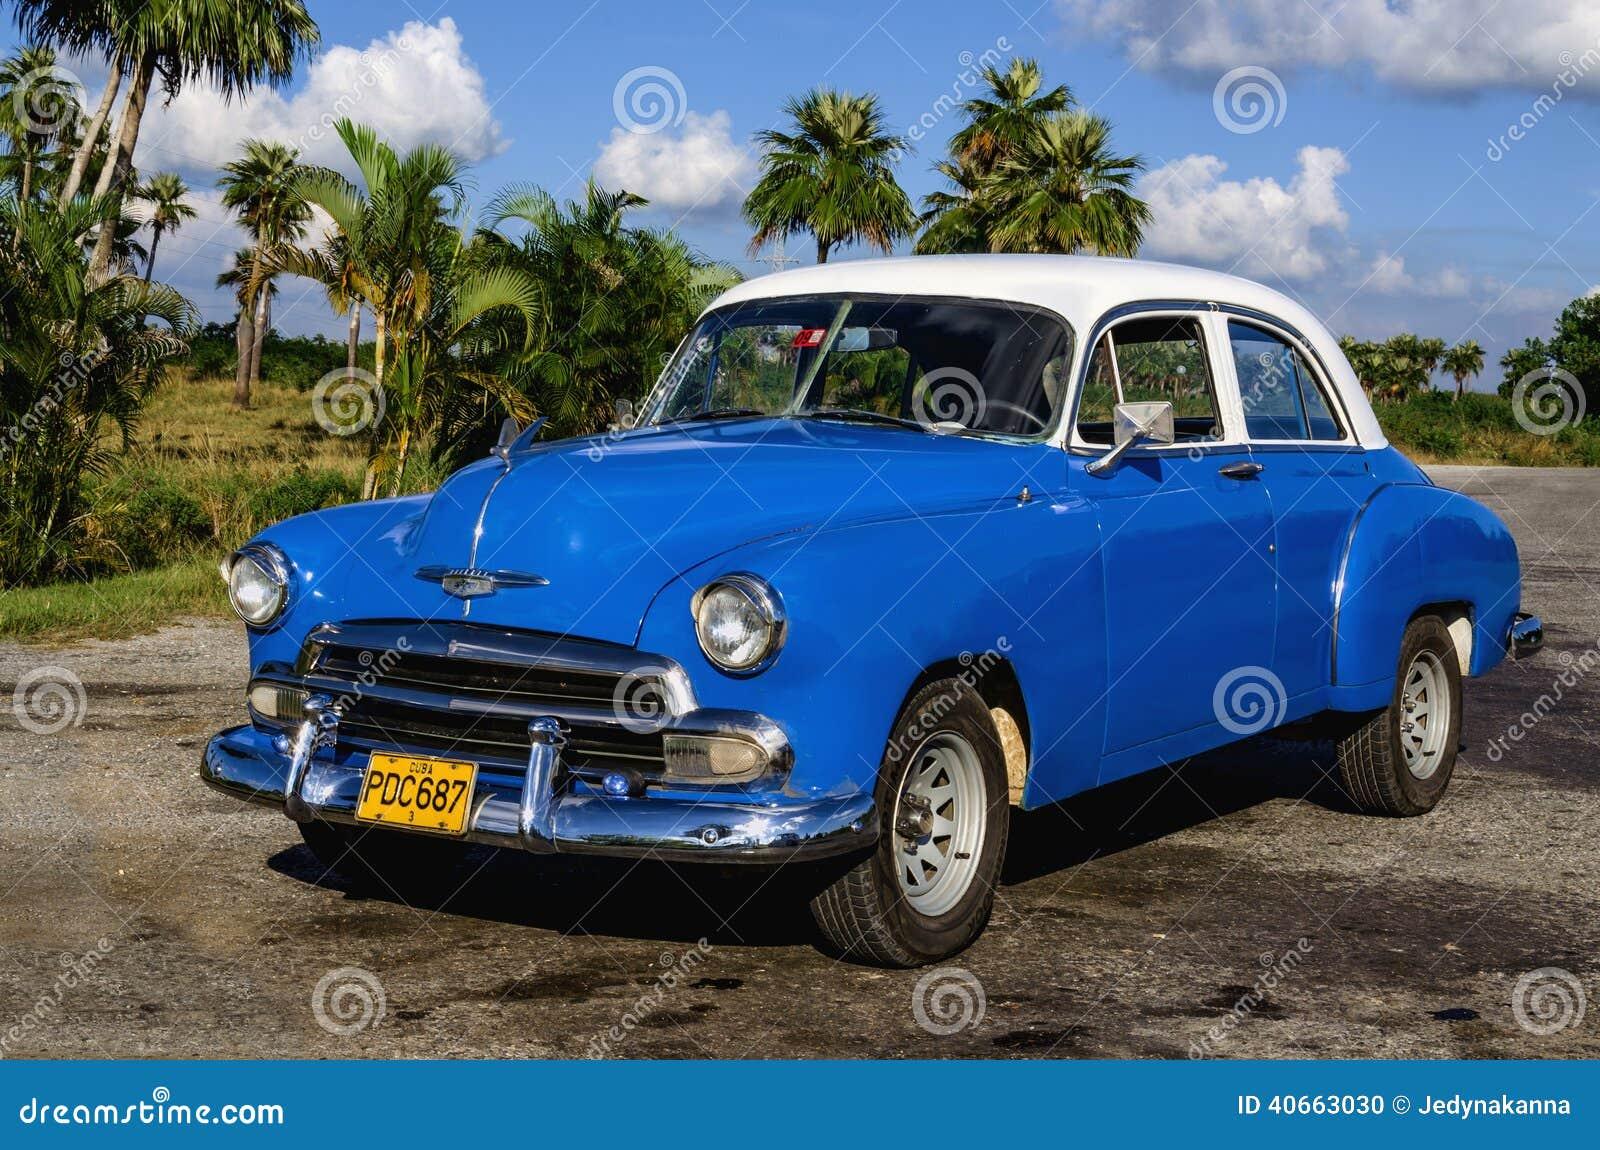 old vintage american blue car in havana city royalty free stock photography. Black Bedroom Furniture Sets. Home Design Ideas